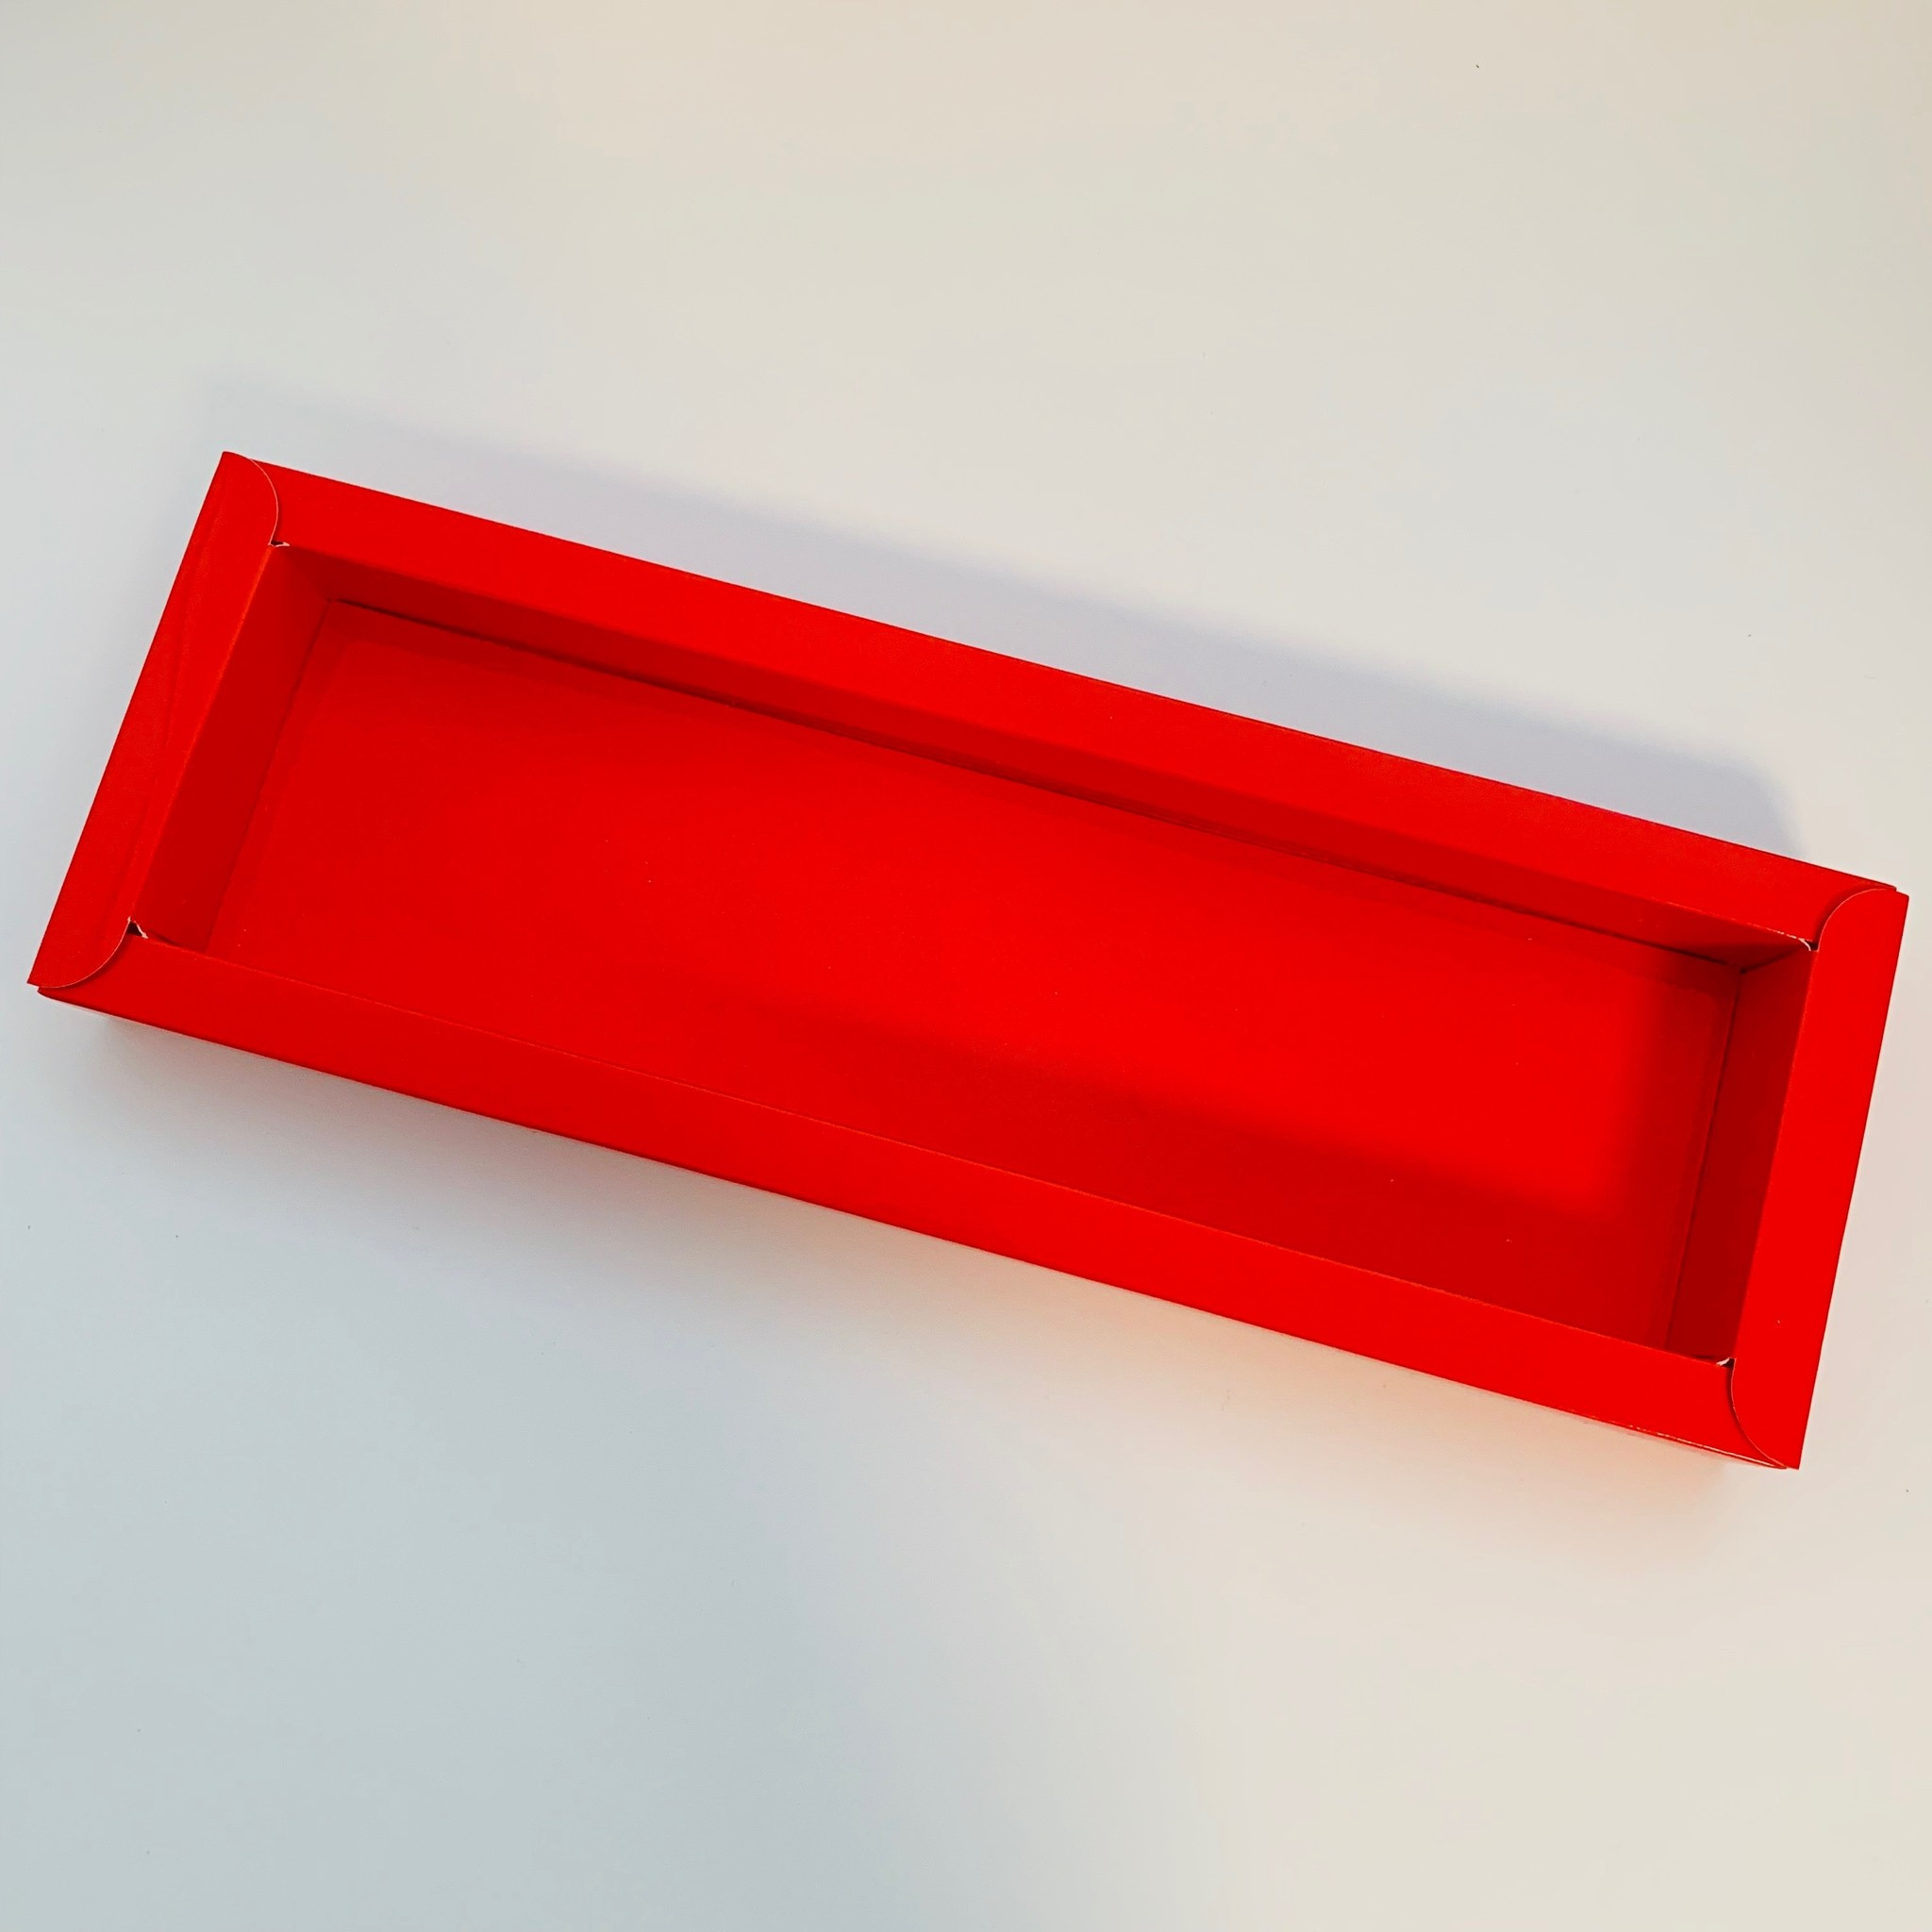 Hollewand verpakking NR.MAW inhoud:  305x78x40mm